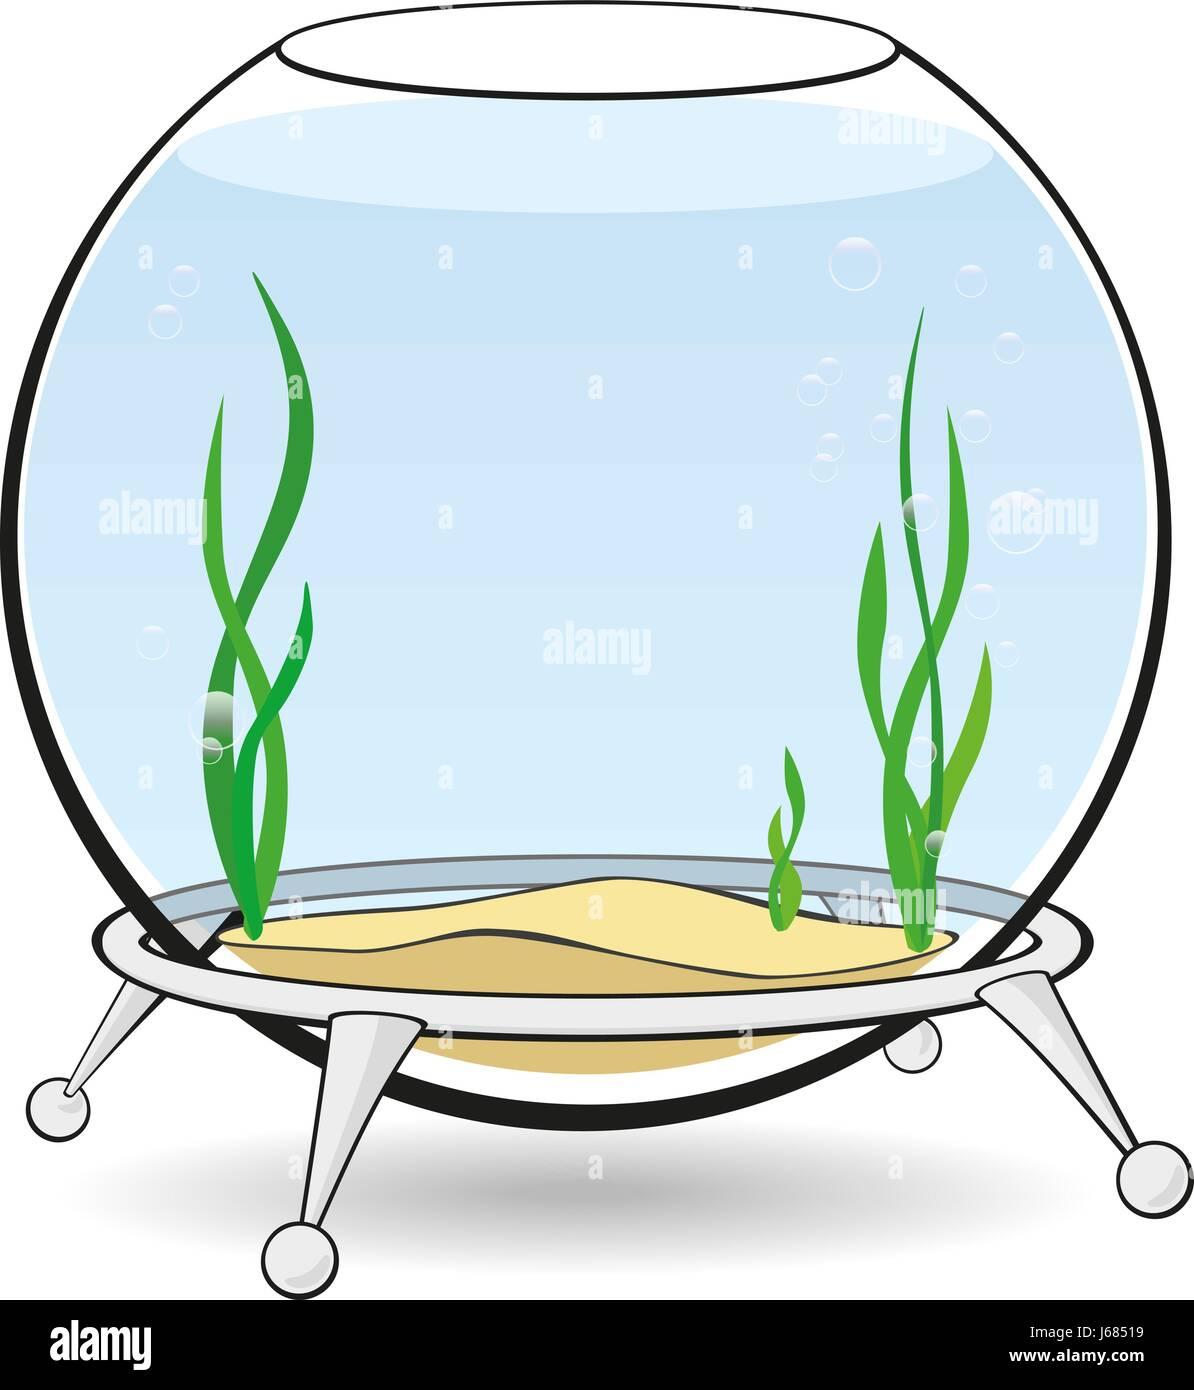 a round aquarium for fish stock vector art u0026 illustration vector